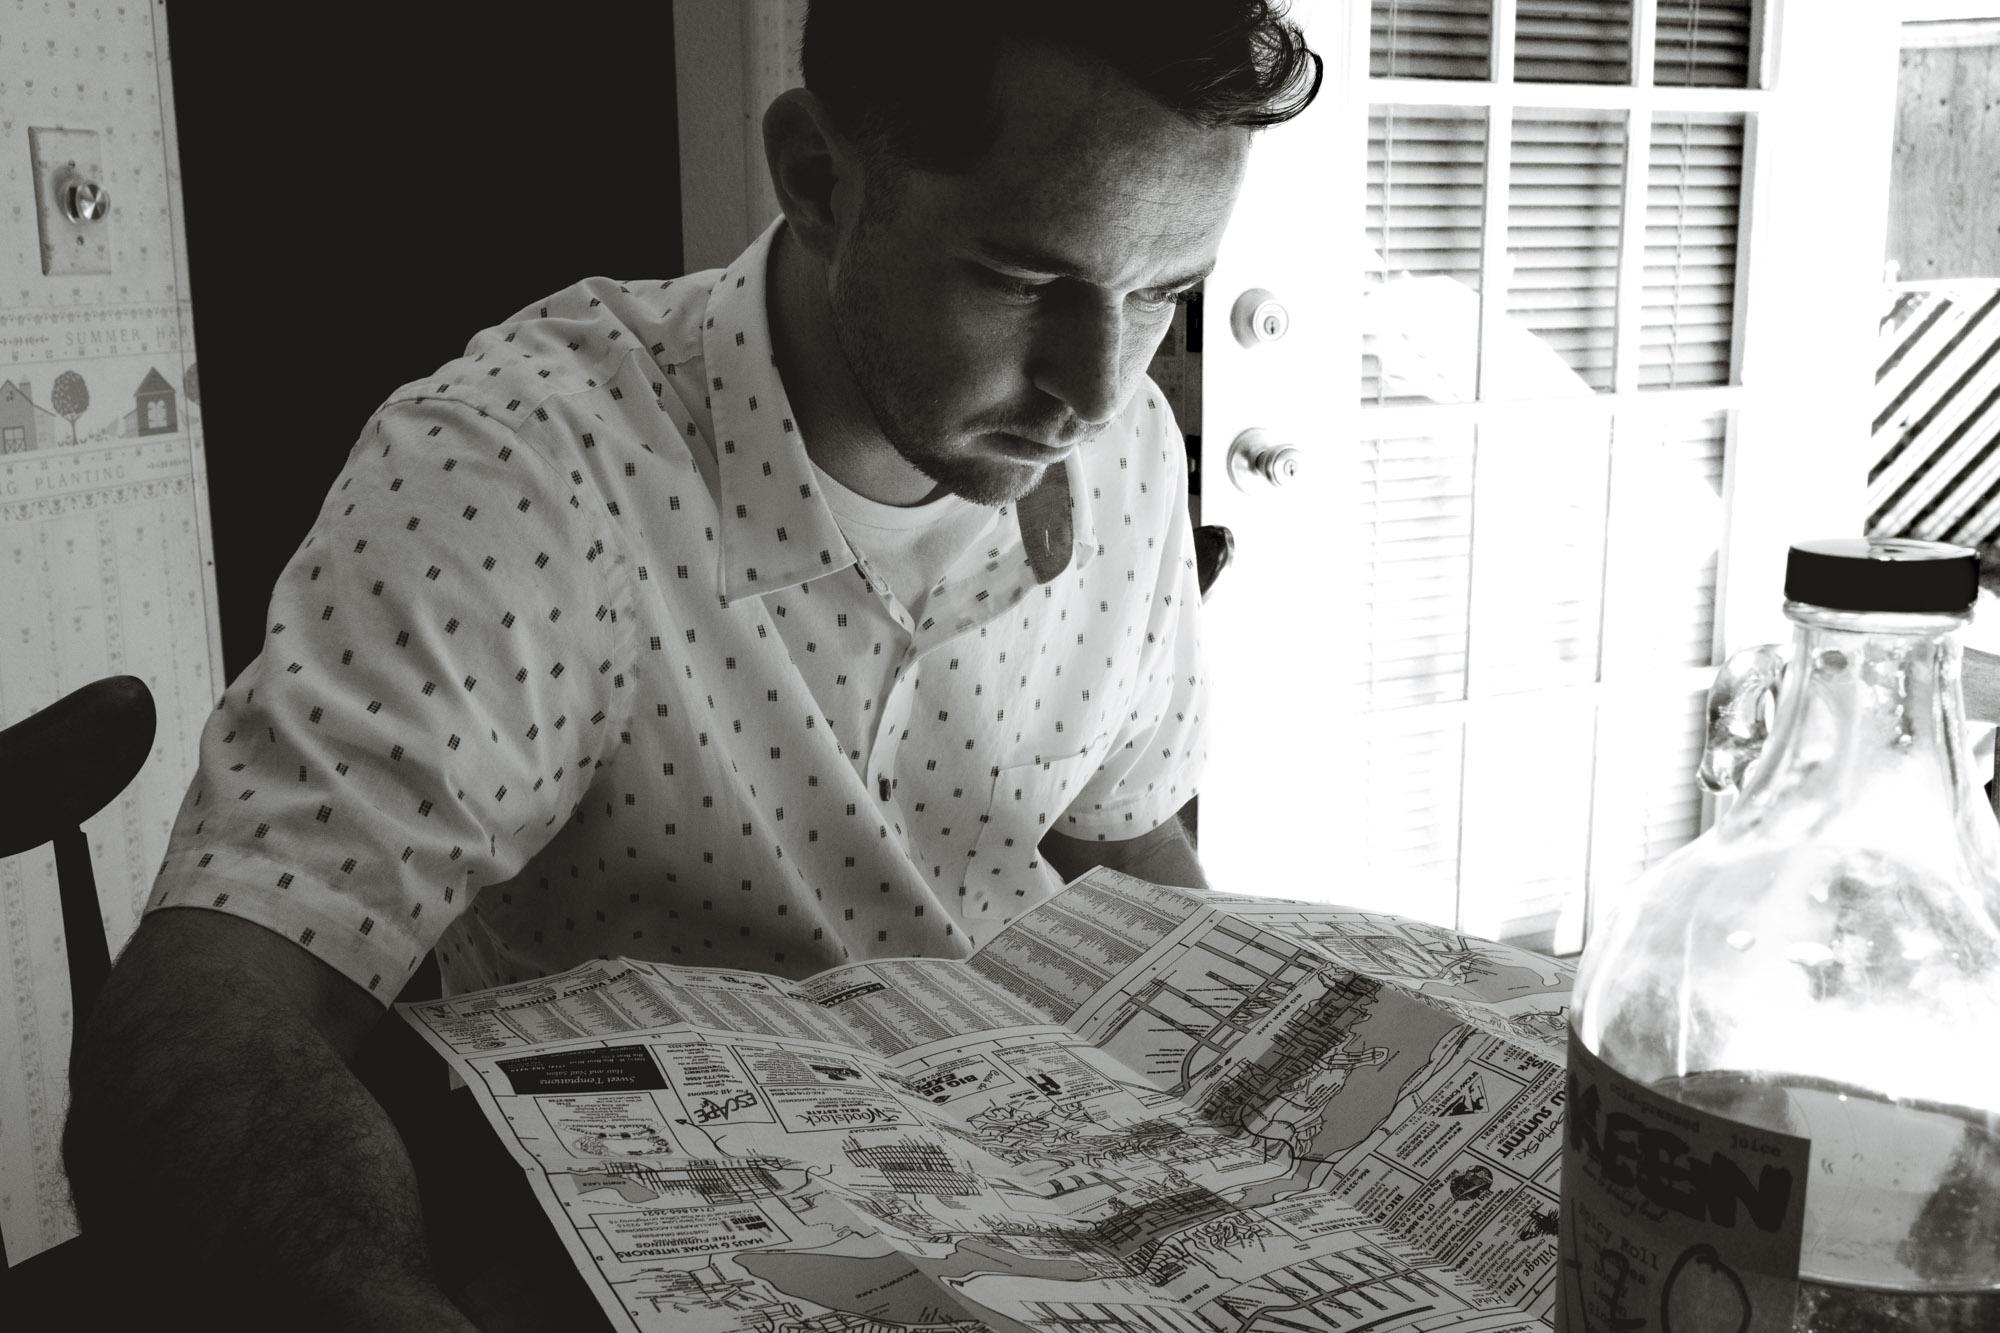 Ian reading a map of Big Bear